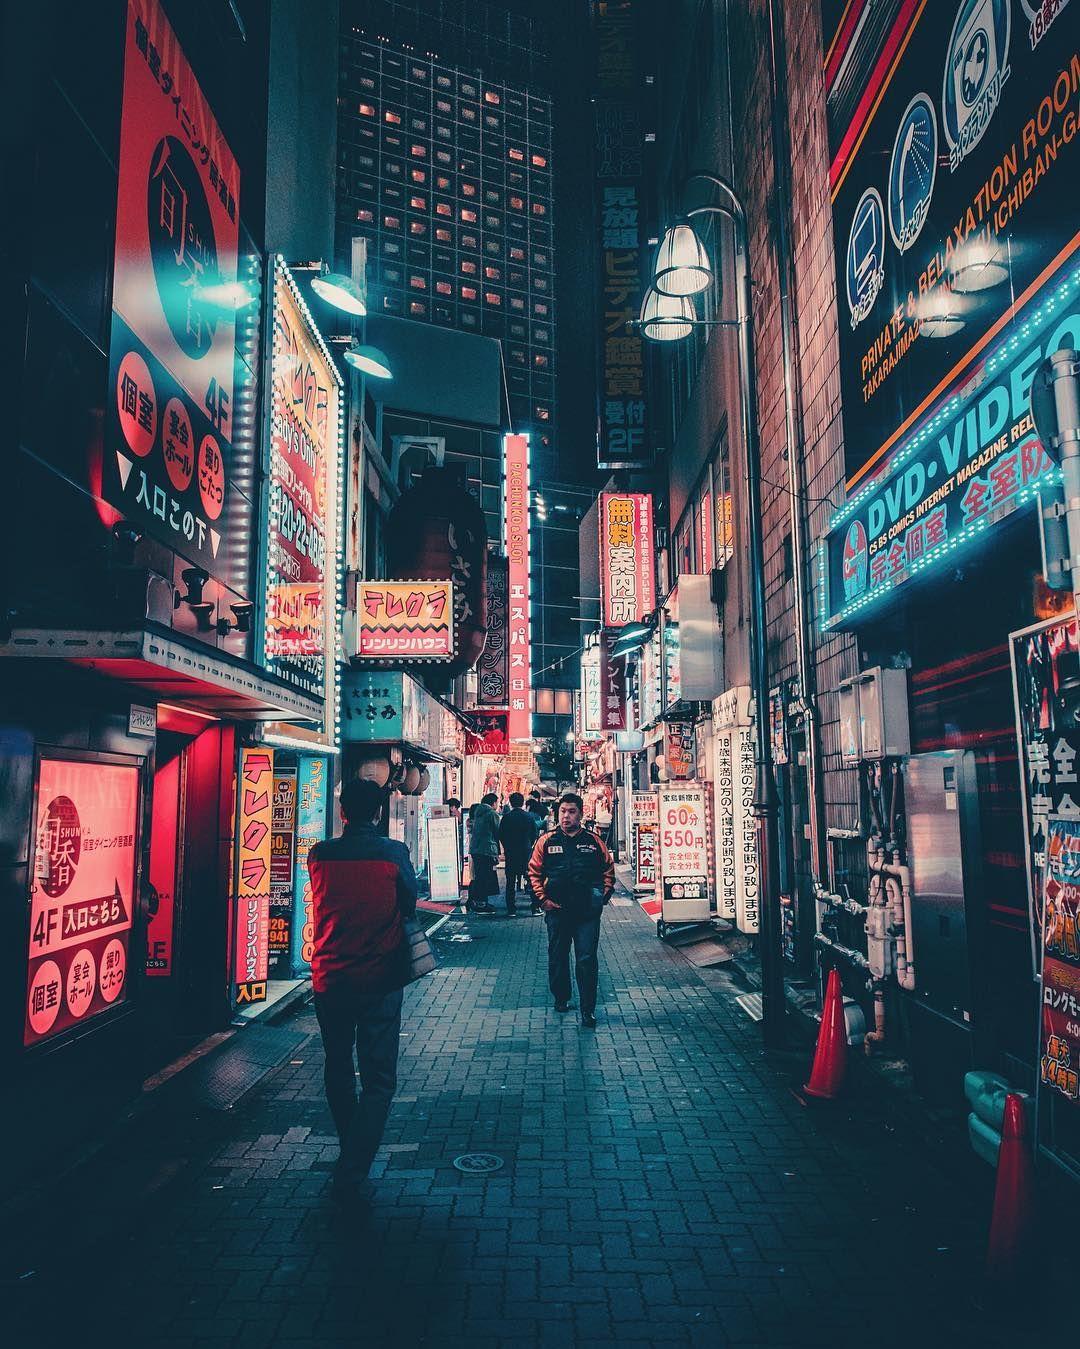 Vibrant Night graphy of Tokyo s Streets by Keiichiro Kinoshita